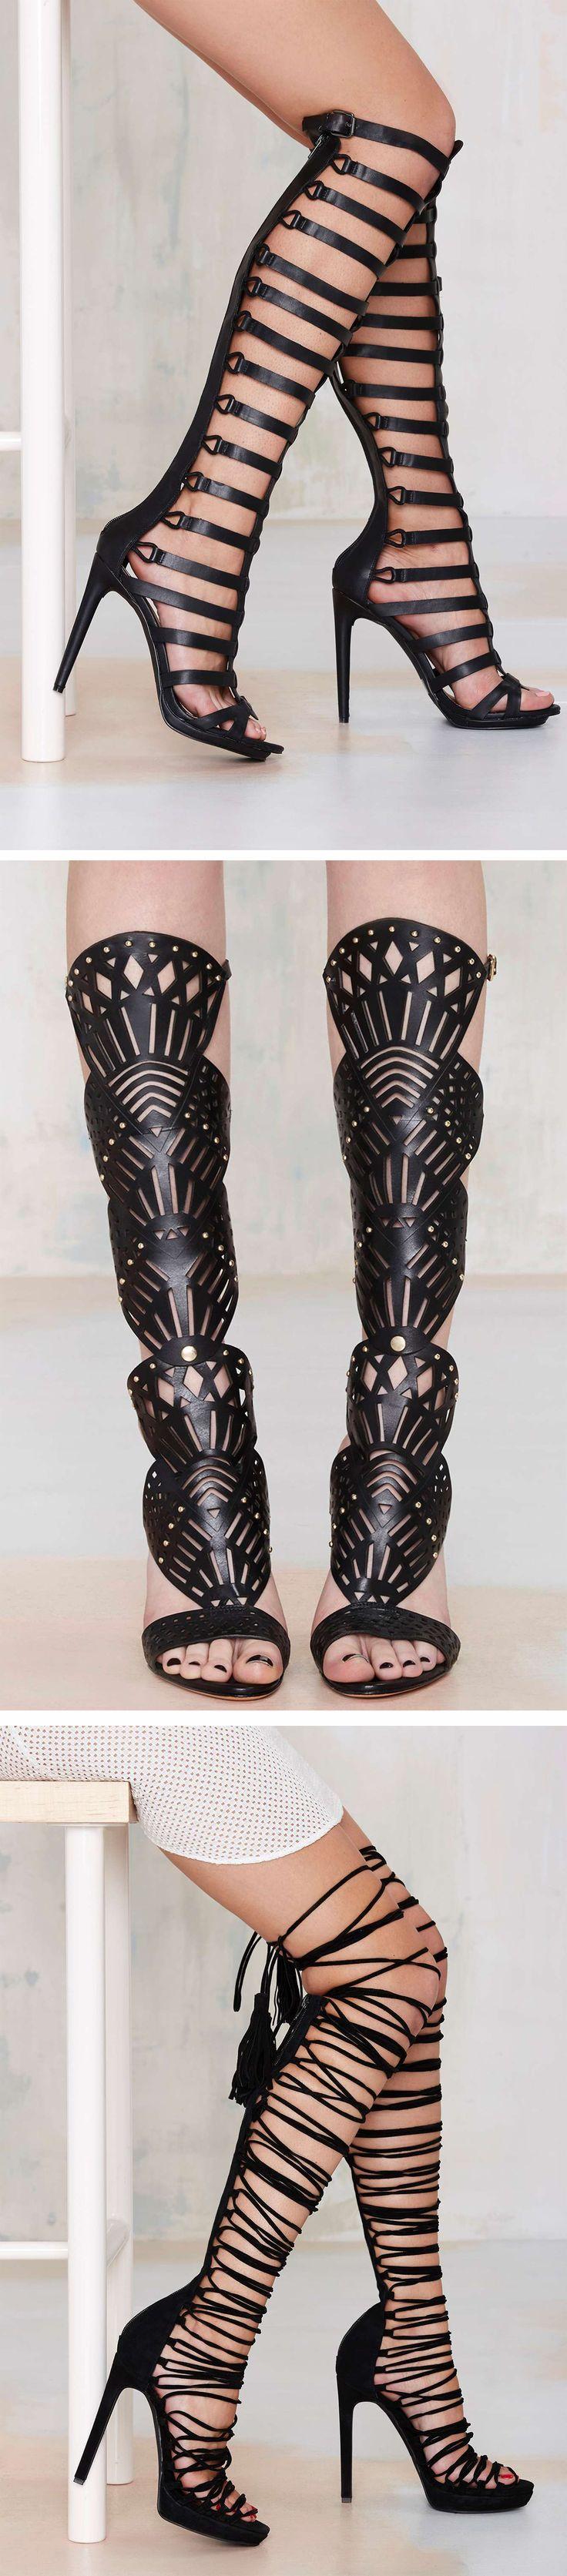 Best 25  Black gladiator heels ideas on Pinterest | Sexy heels ...